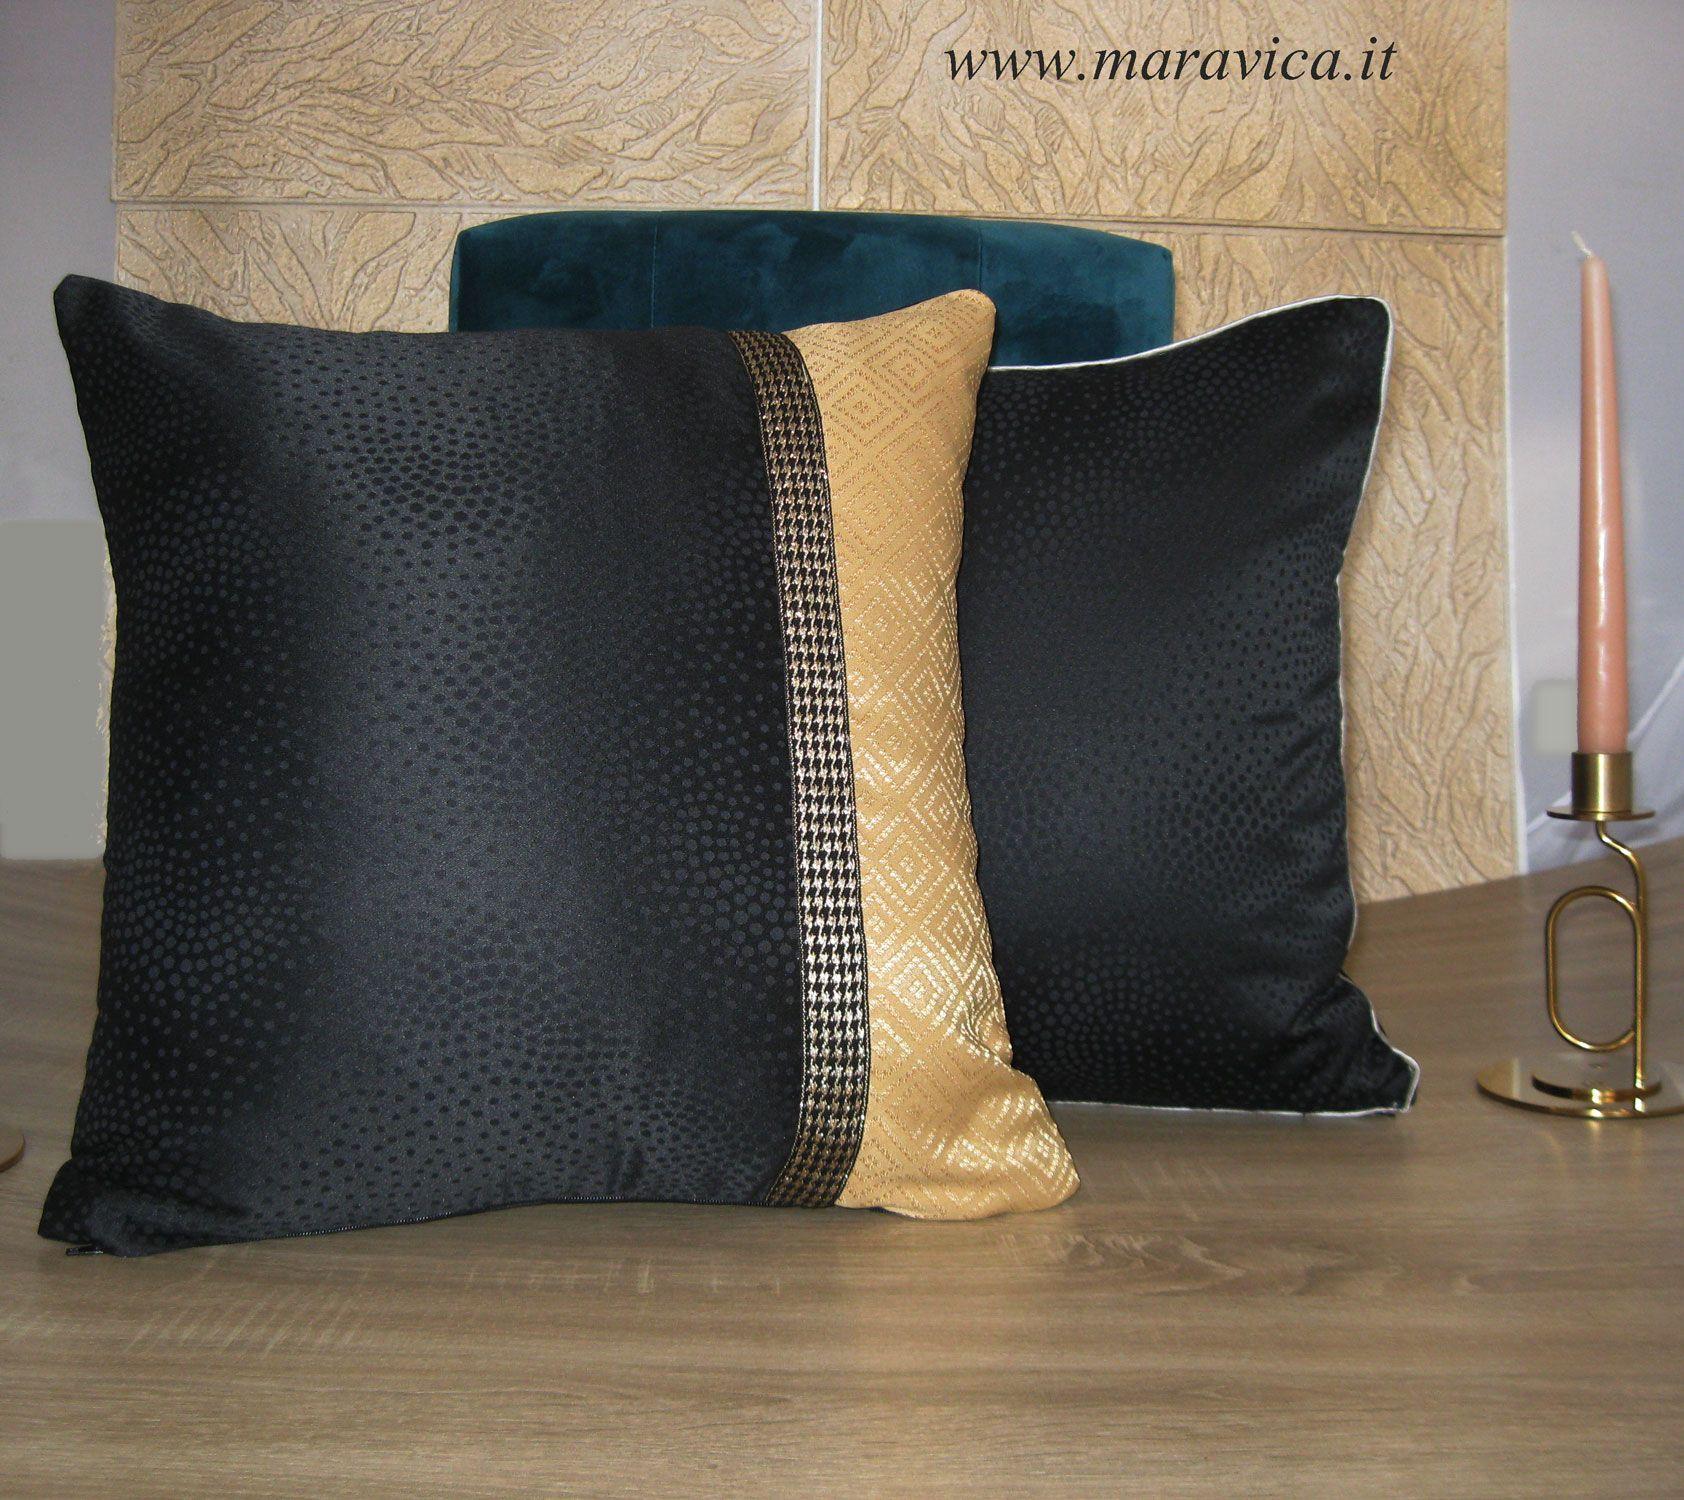 Cuscini Moderni.Cuscini Arredo Per Divani Moderni Home Couture Made In Italy